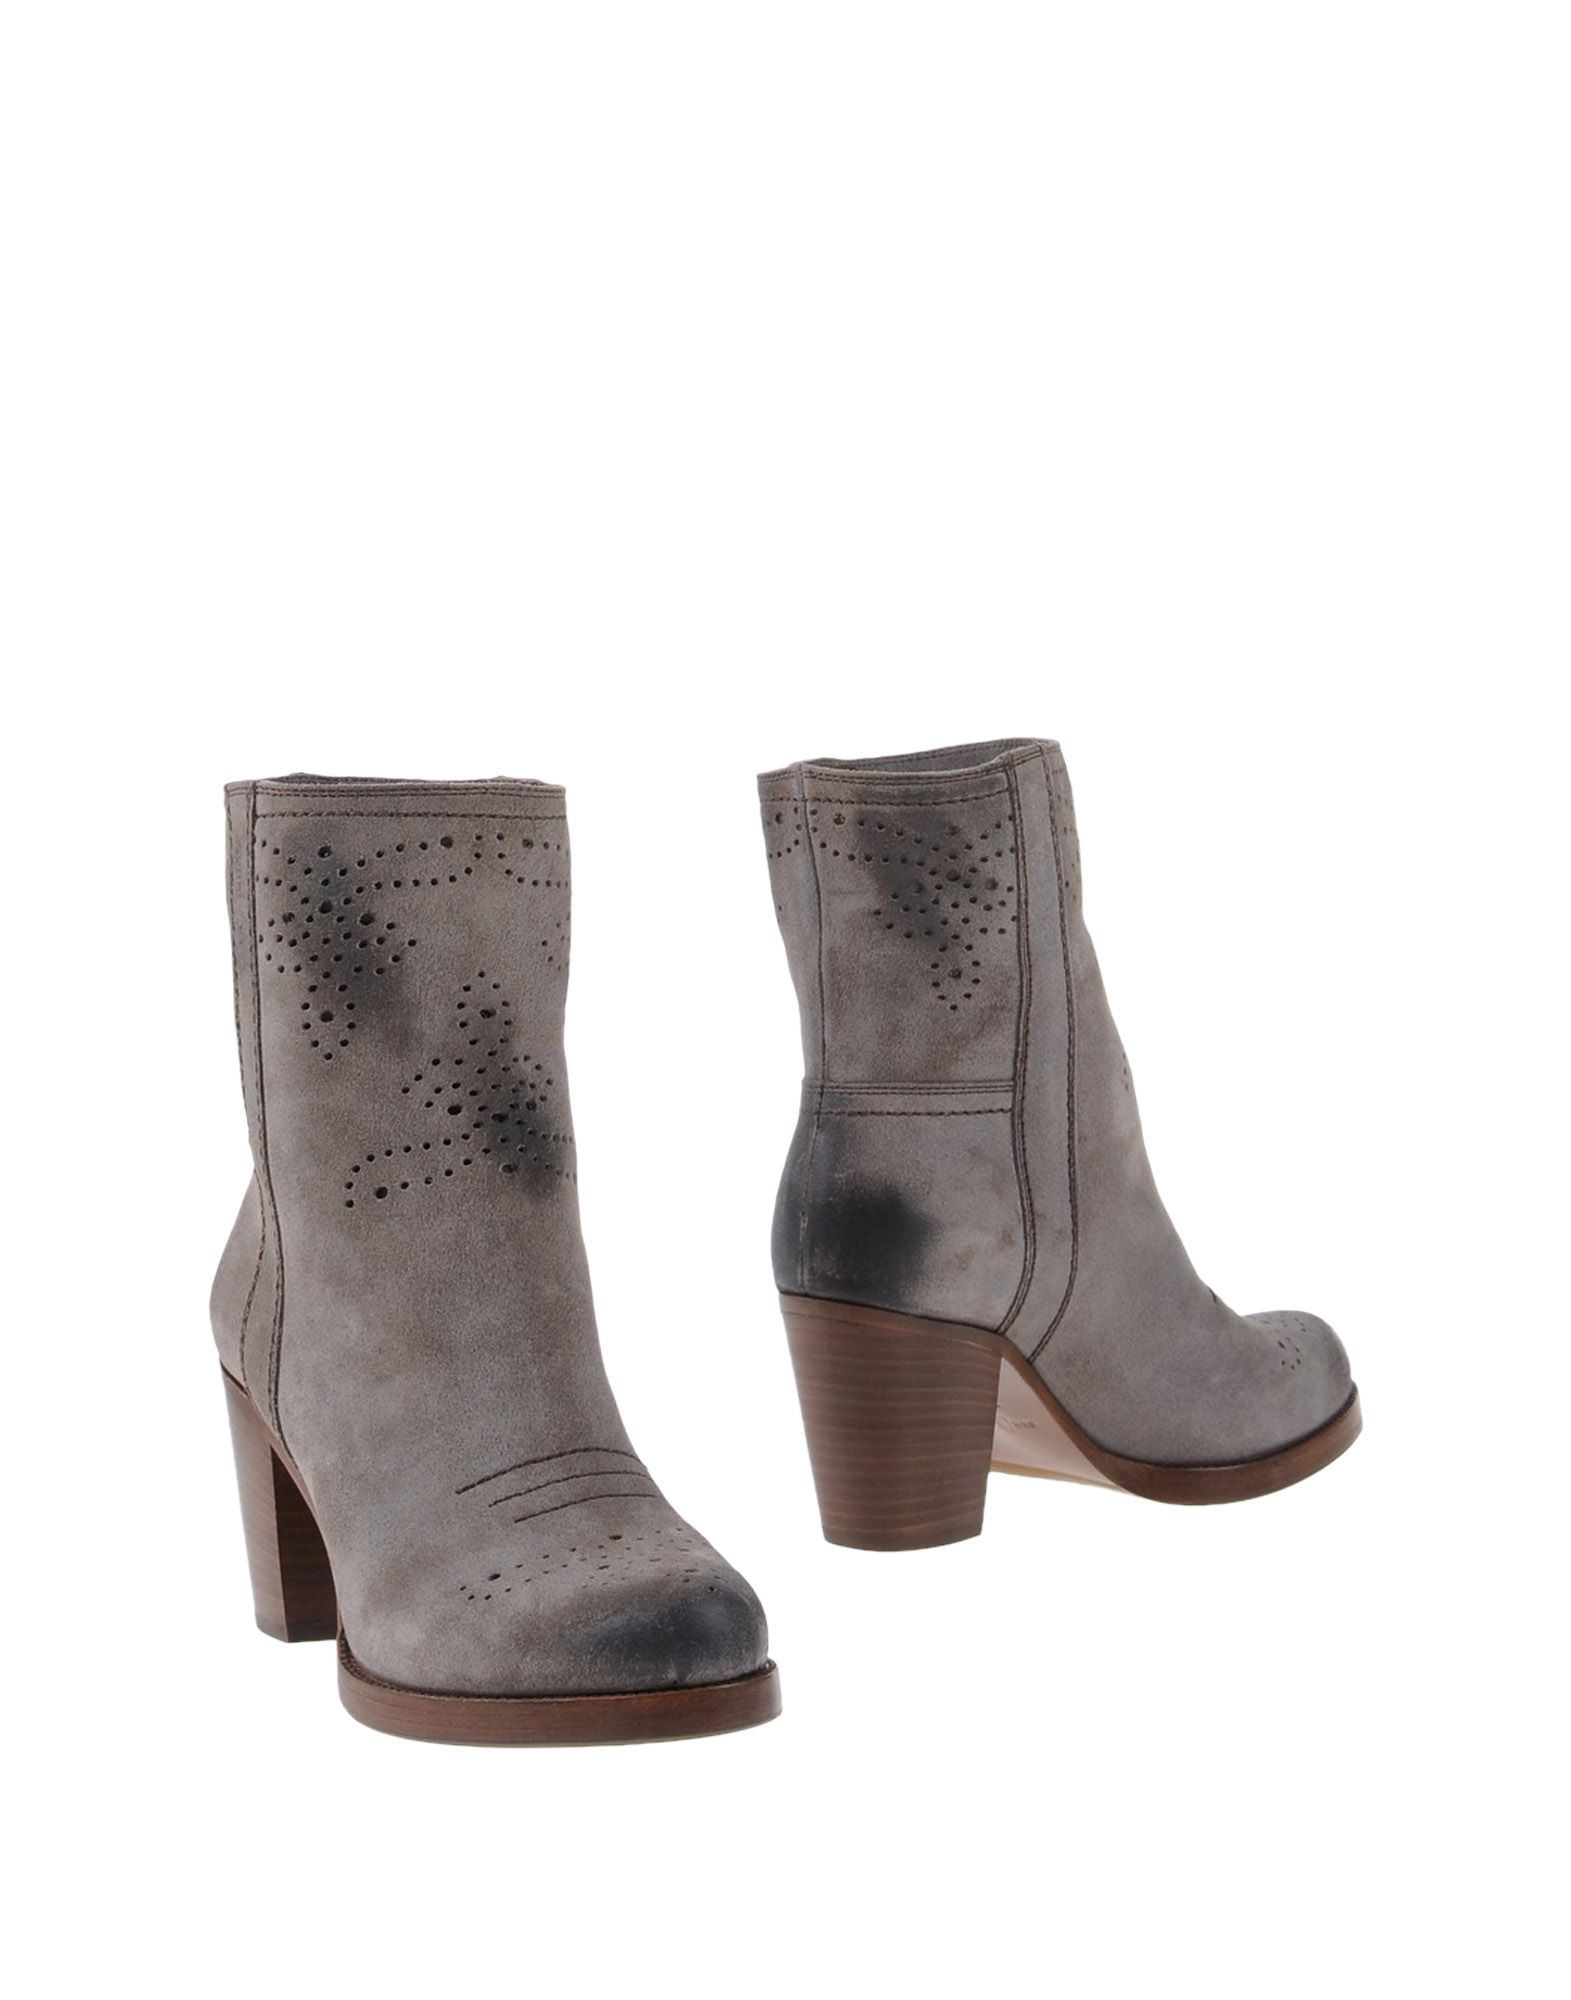 CARSHOE Полусапоги и высокие ботинки mazzitti полусапоги и высокие ботинки